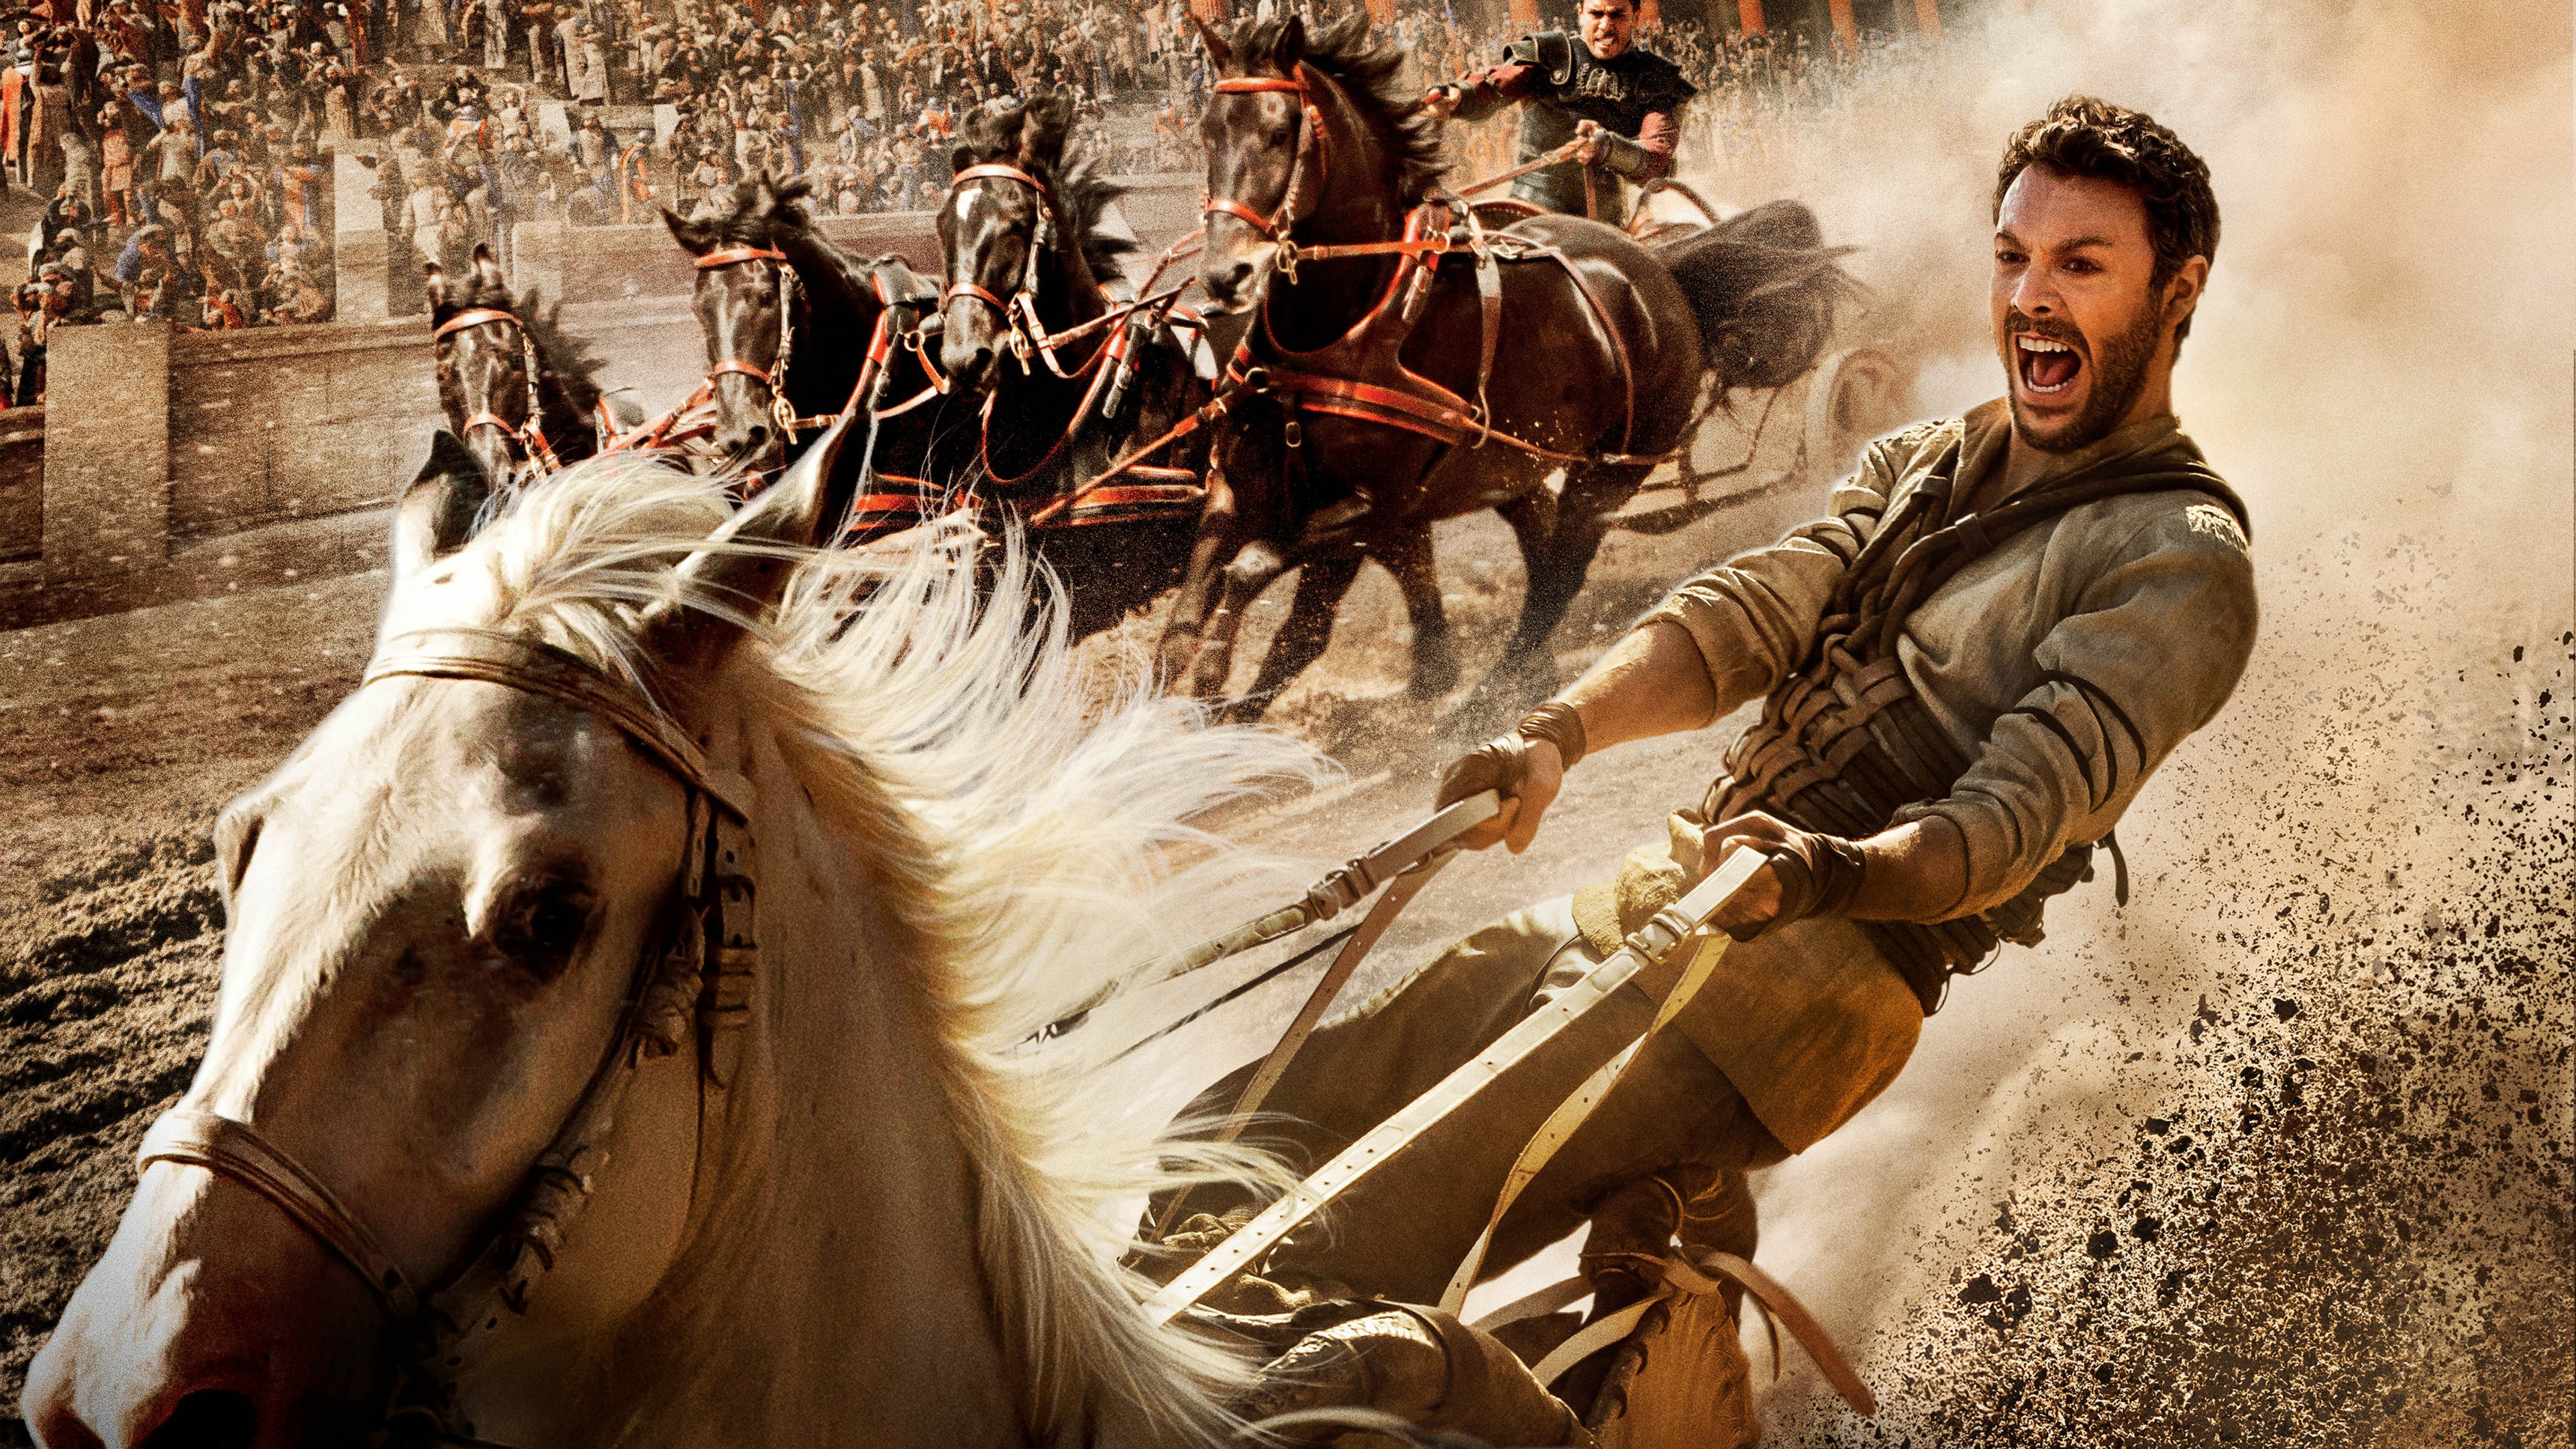 ben hur 2016 movie 1536399093 - Ben Hur 2016 Movie - movies wallpapers, ben hur wallpapers, 2016 movies wallpapers